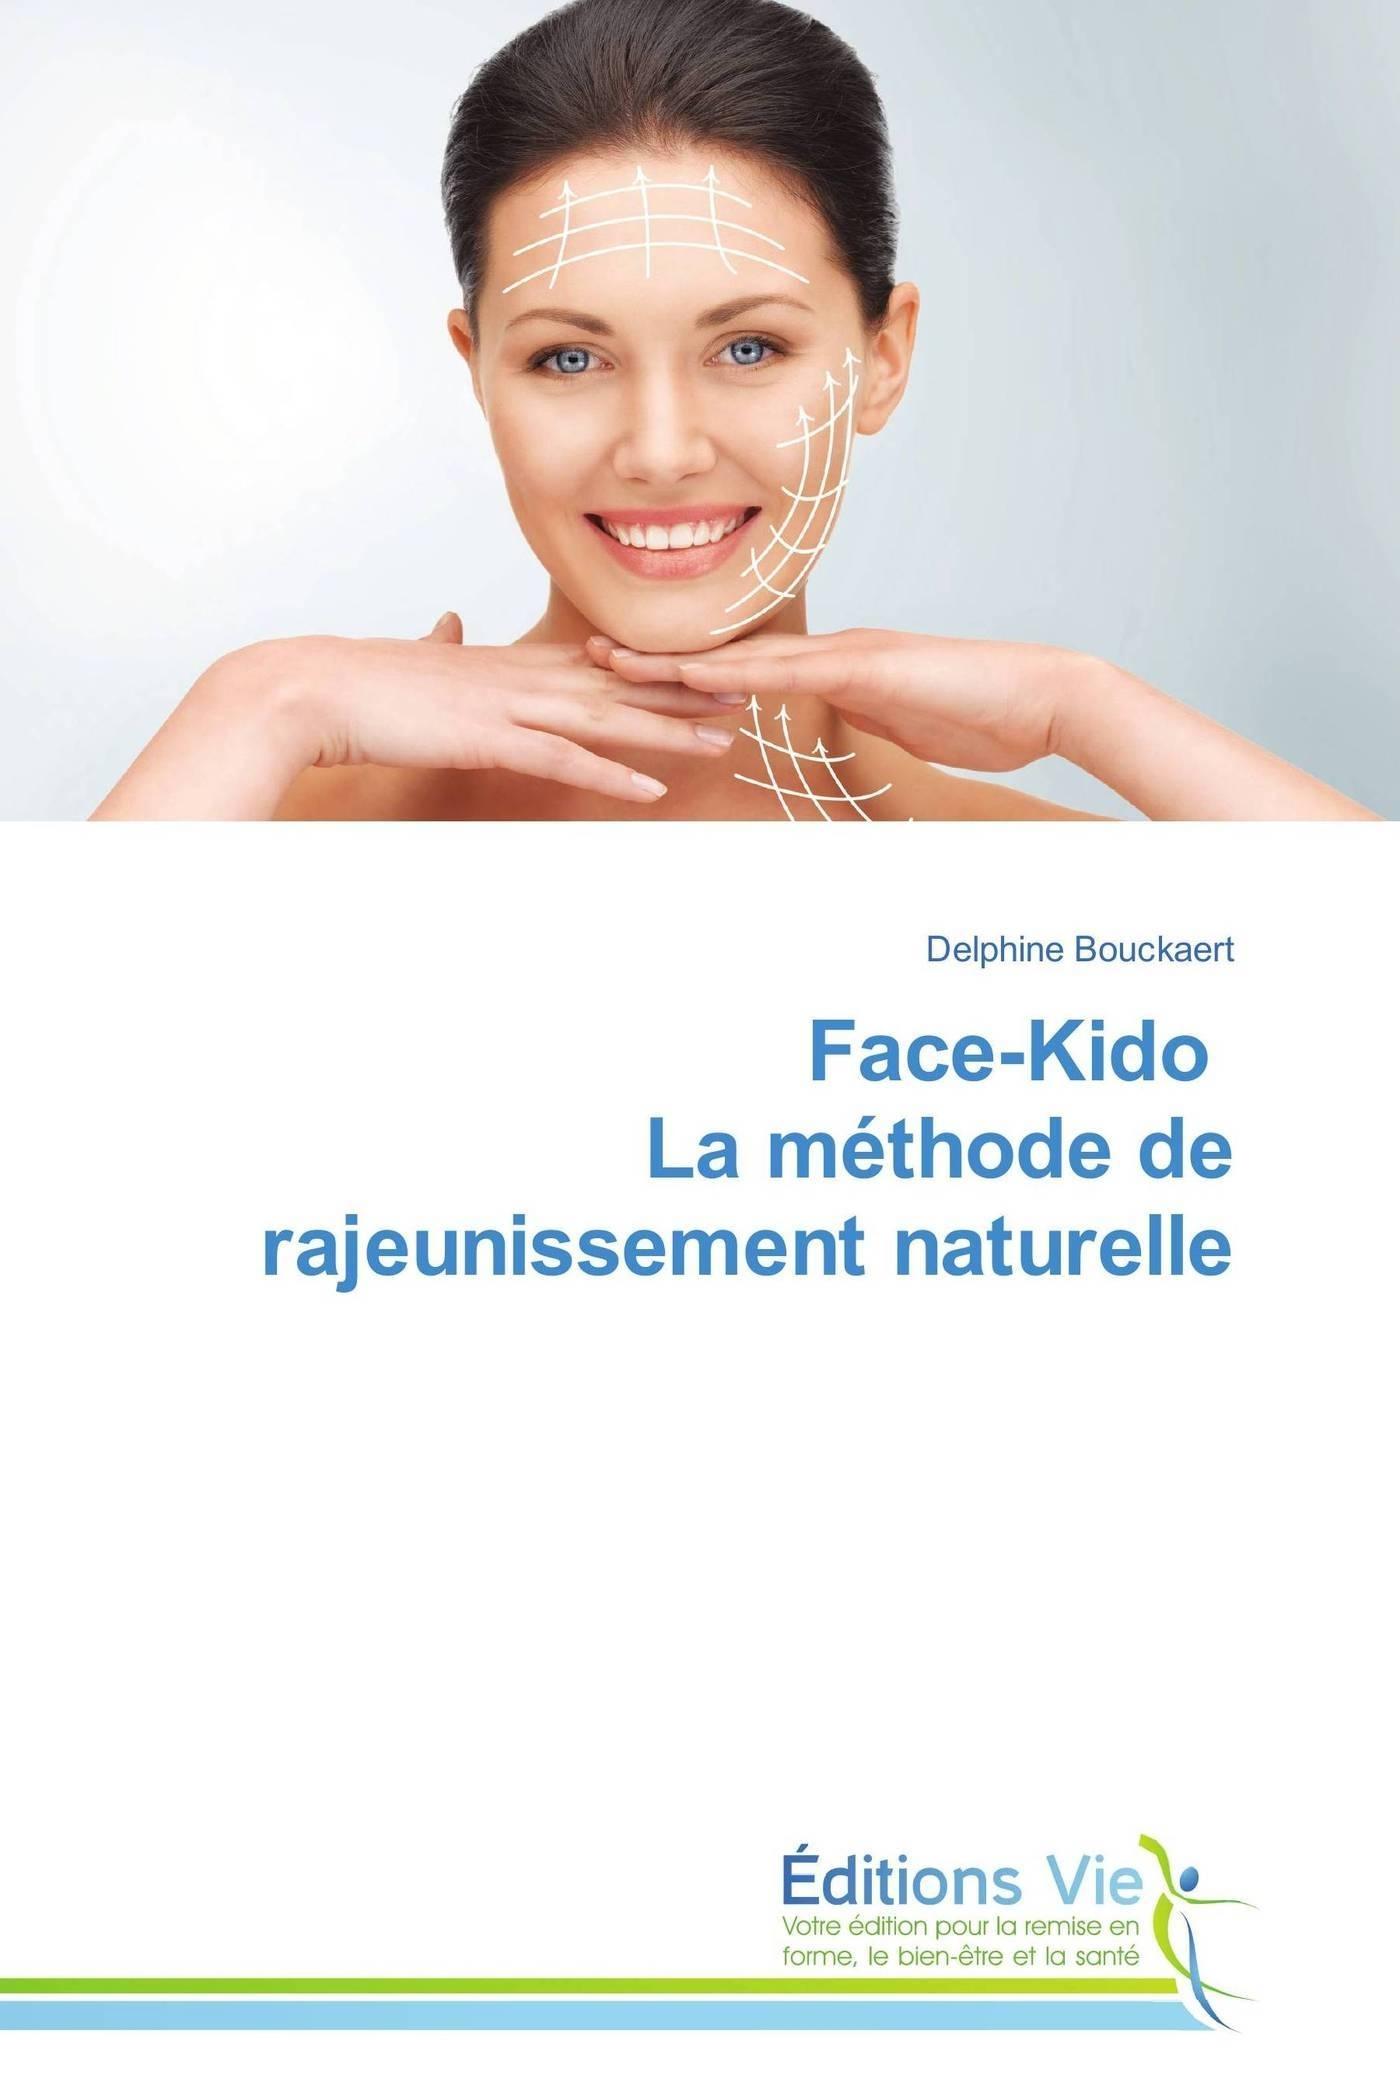 FACE-KIDO LA METHODE DE RAJEUNISSEMENT NATURELLE